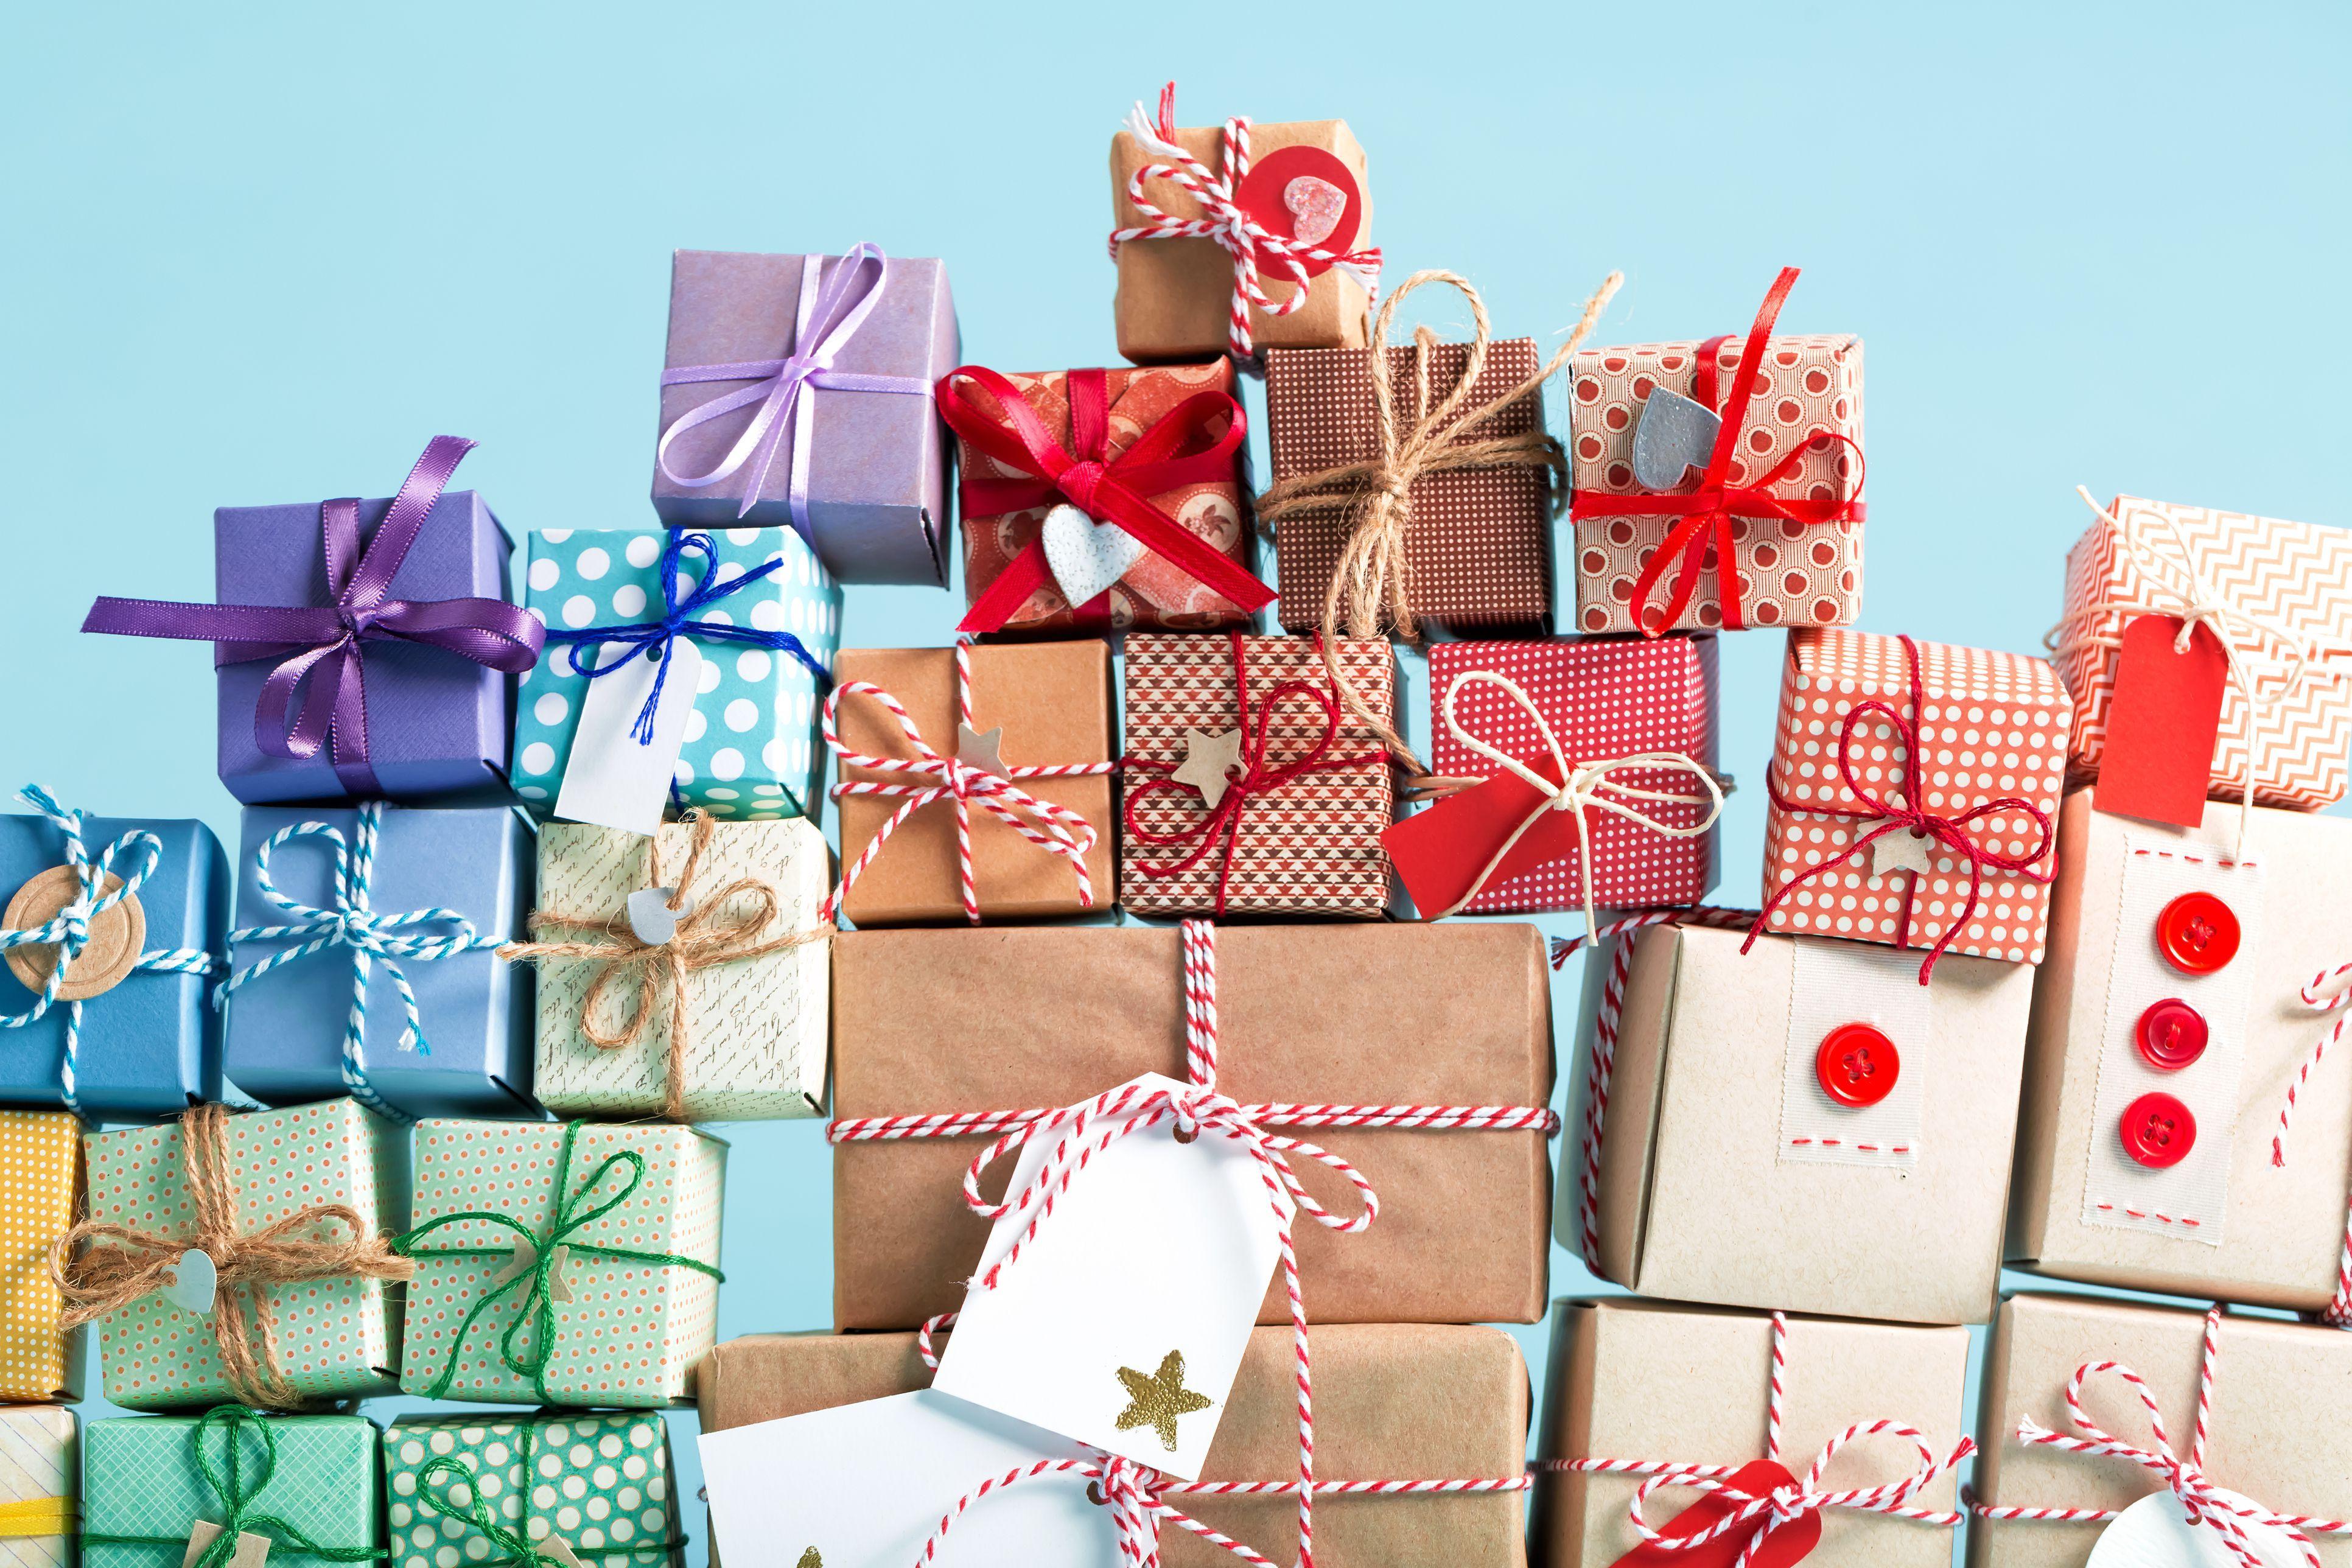 facebooks secret sister gift exchange is a scam facebook gift scam